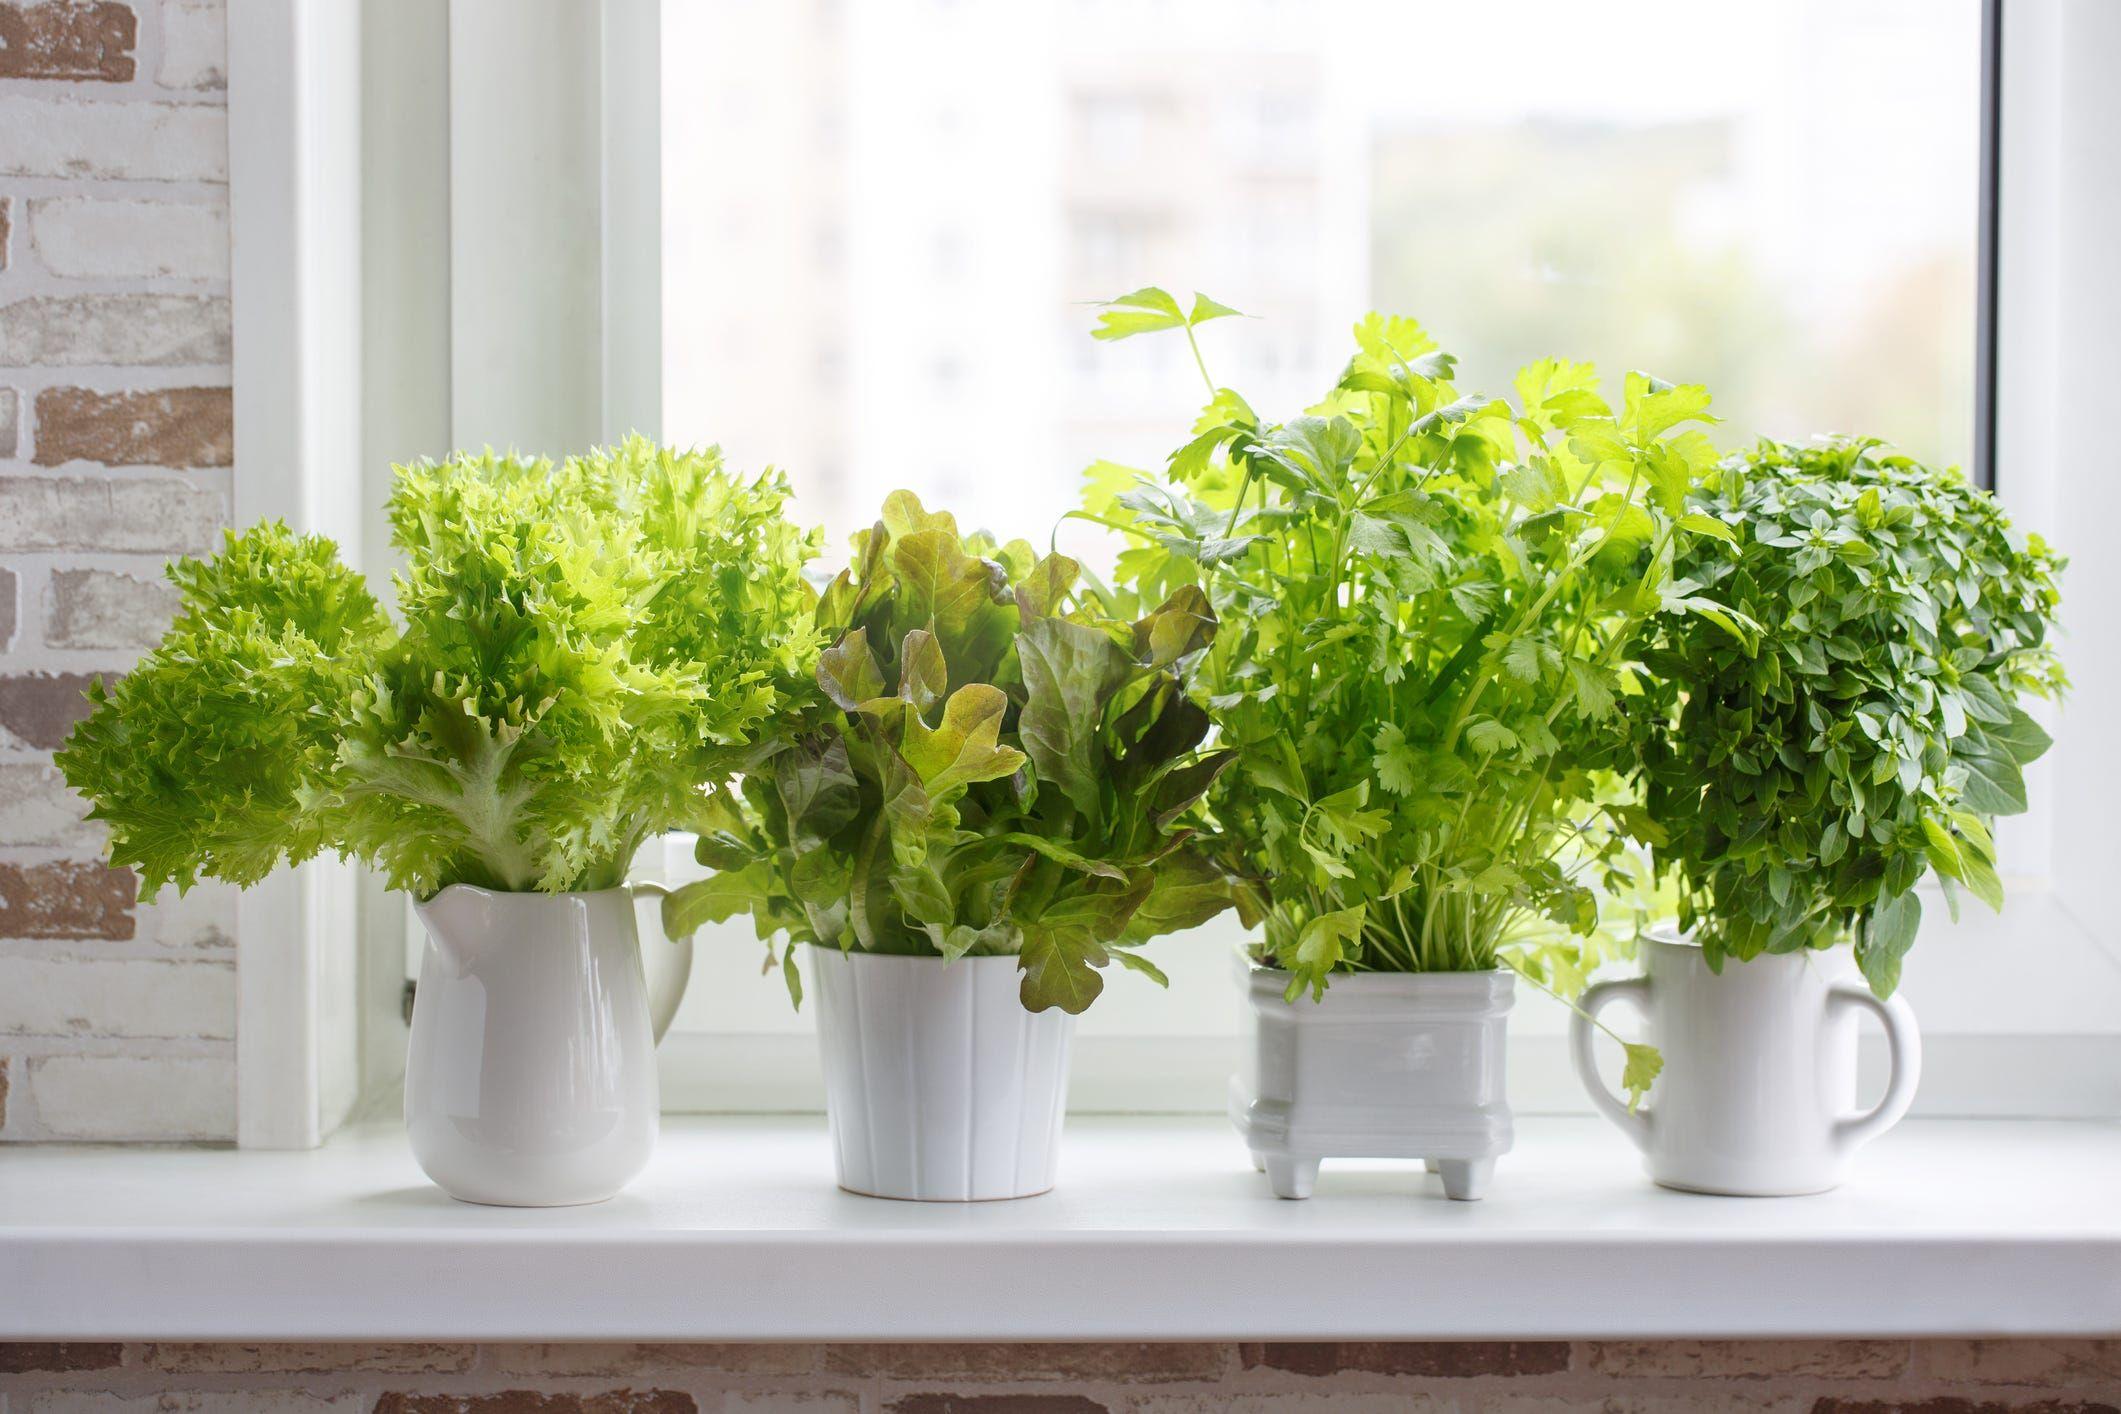 House Beautiful & 14 Indoor Herb Garden Ideas 2019 - Kitchen Herb Planters We Love